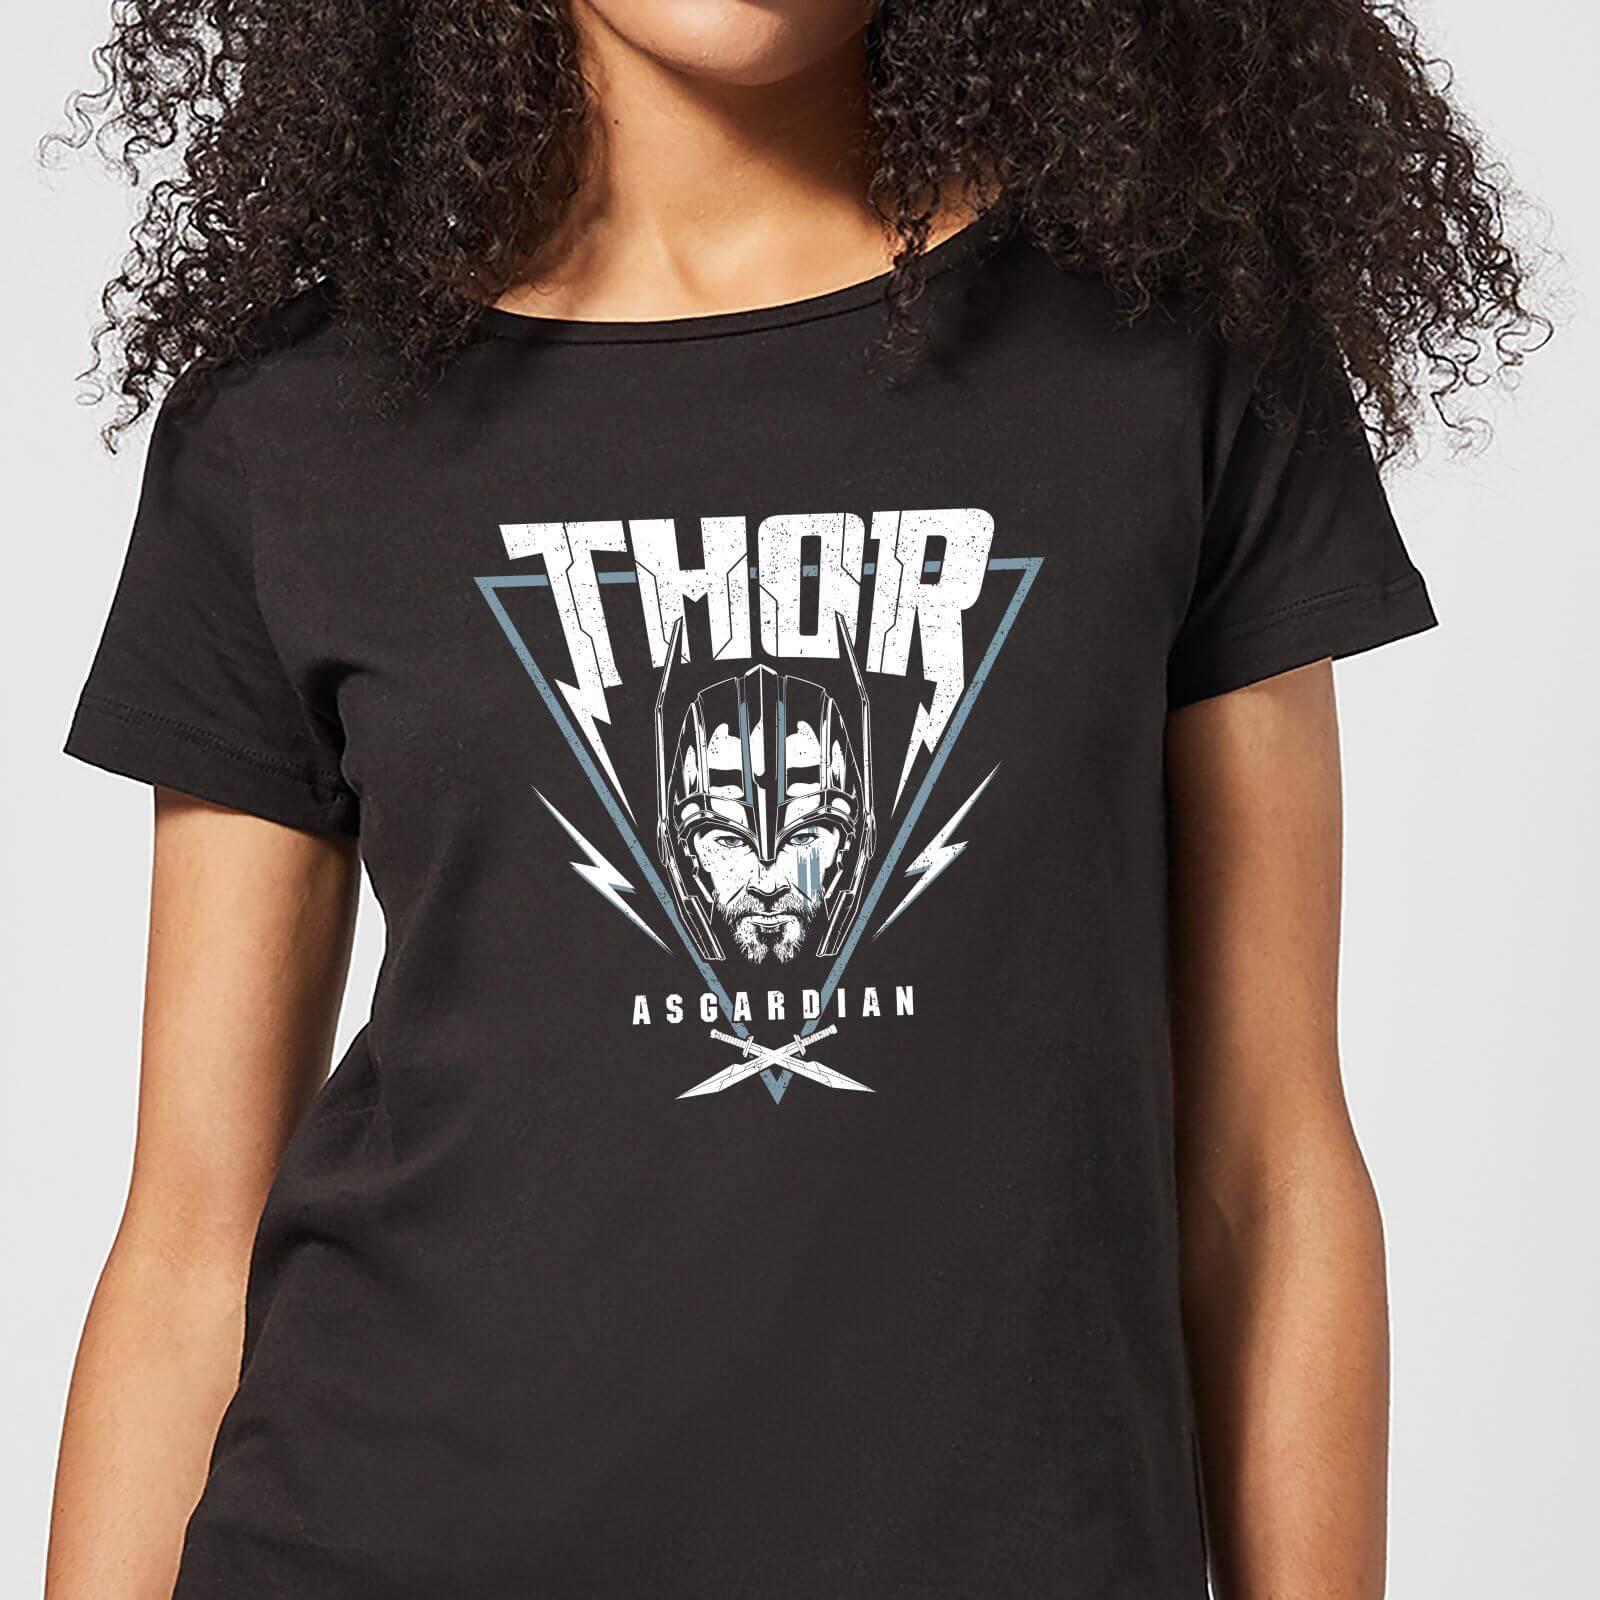 OfferteWeb.click 68-t-shirt-marvel-thor-ragnarok-asgardian-triangle-nero